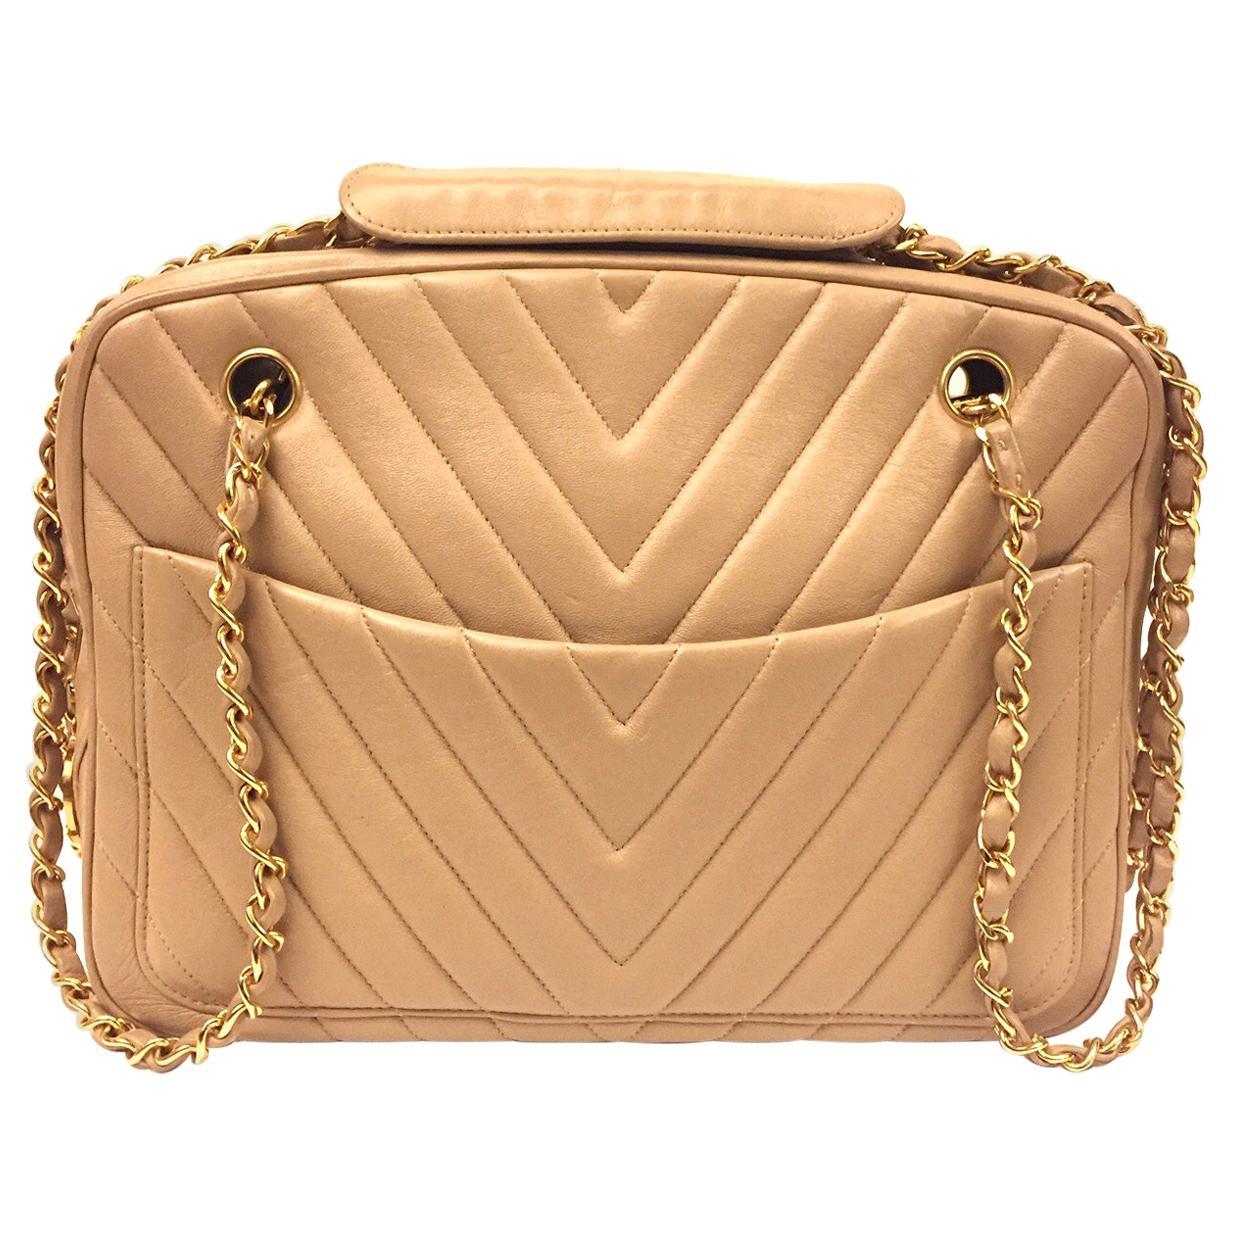 Chanel beige chevron shoulder bag